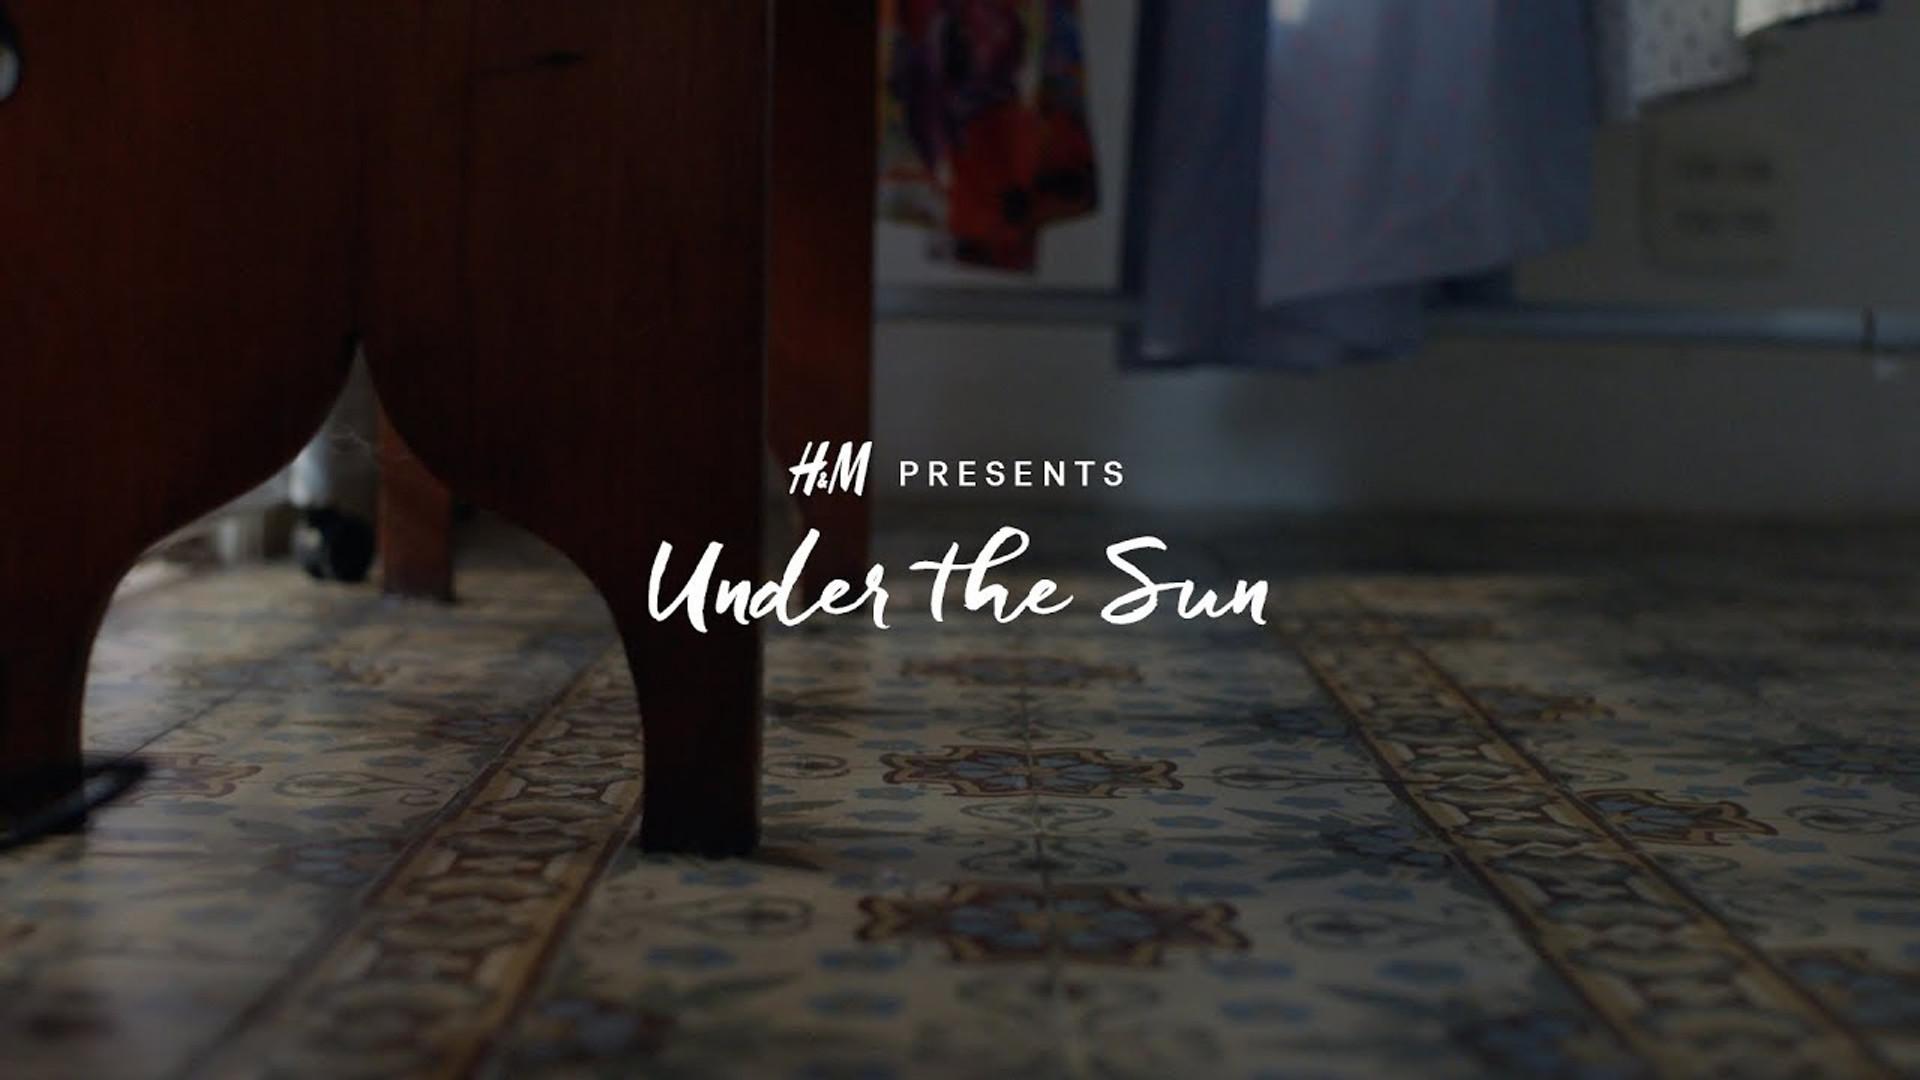 UNDER THE SUN - H&M